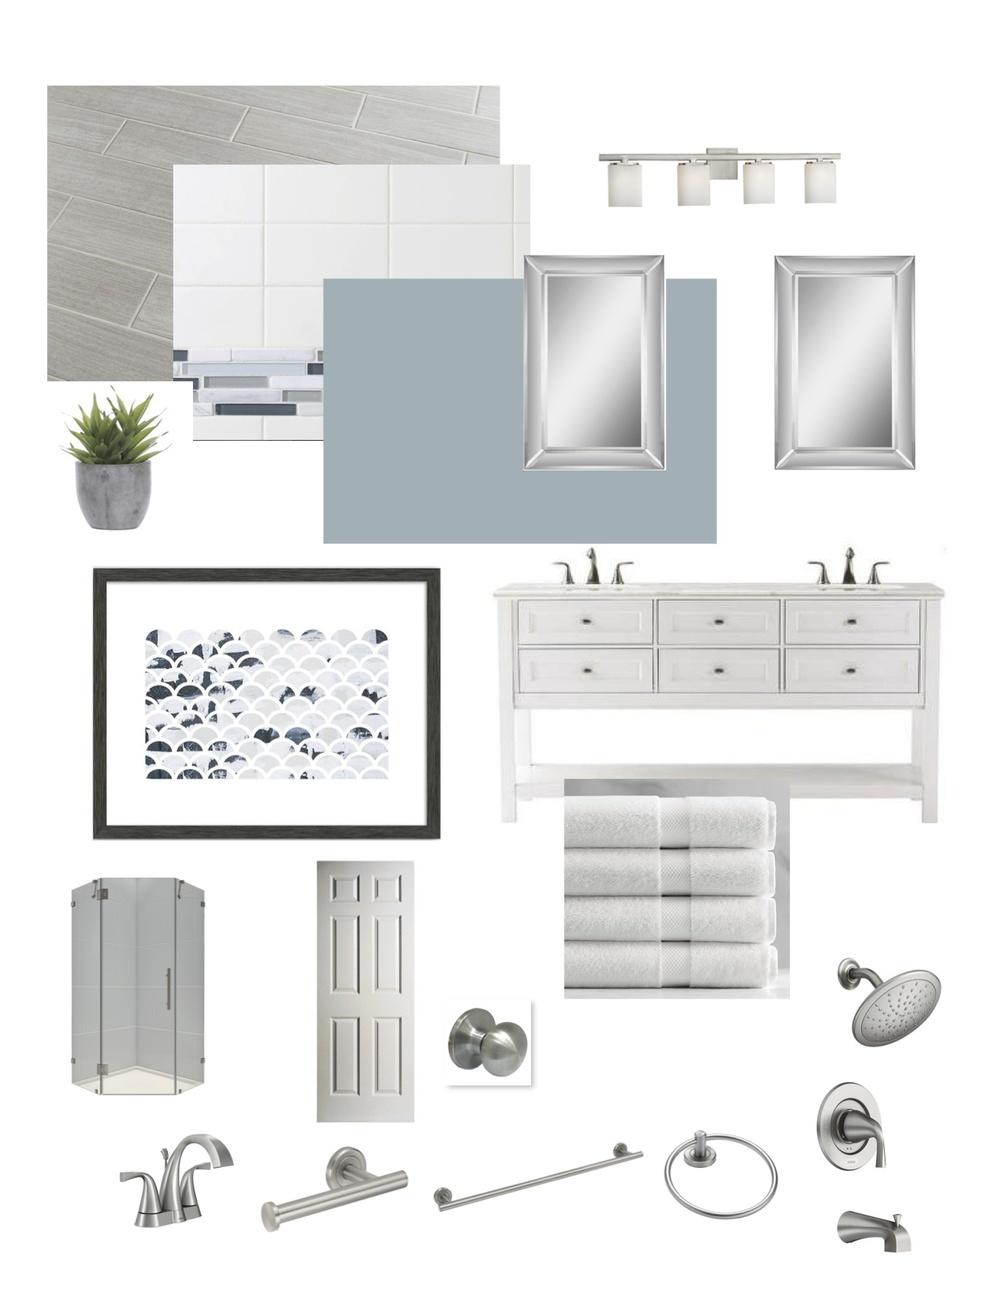 Bathroom remodel for under 6 000 dwelling studio for Bathroom design board